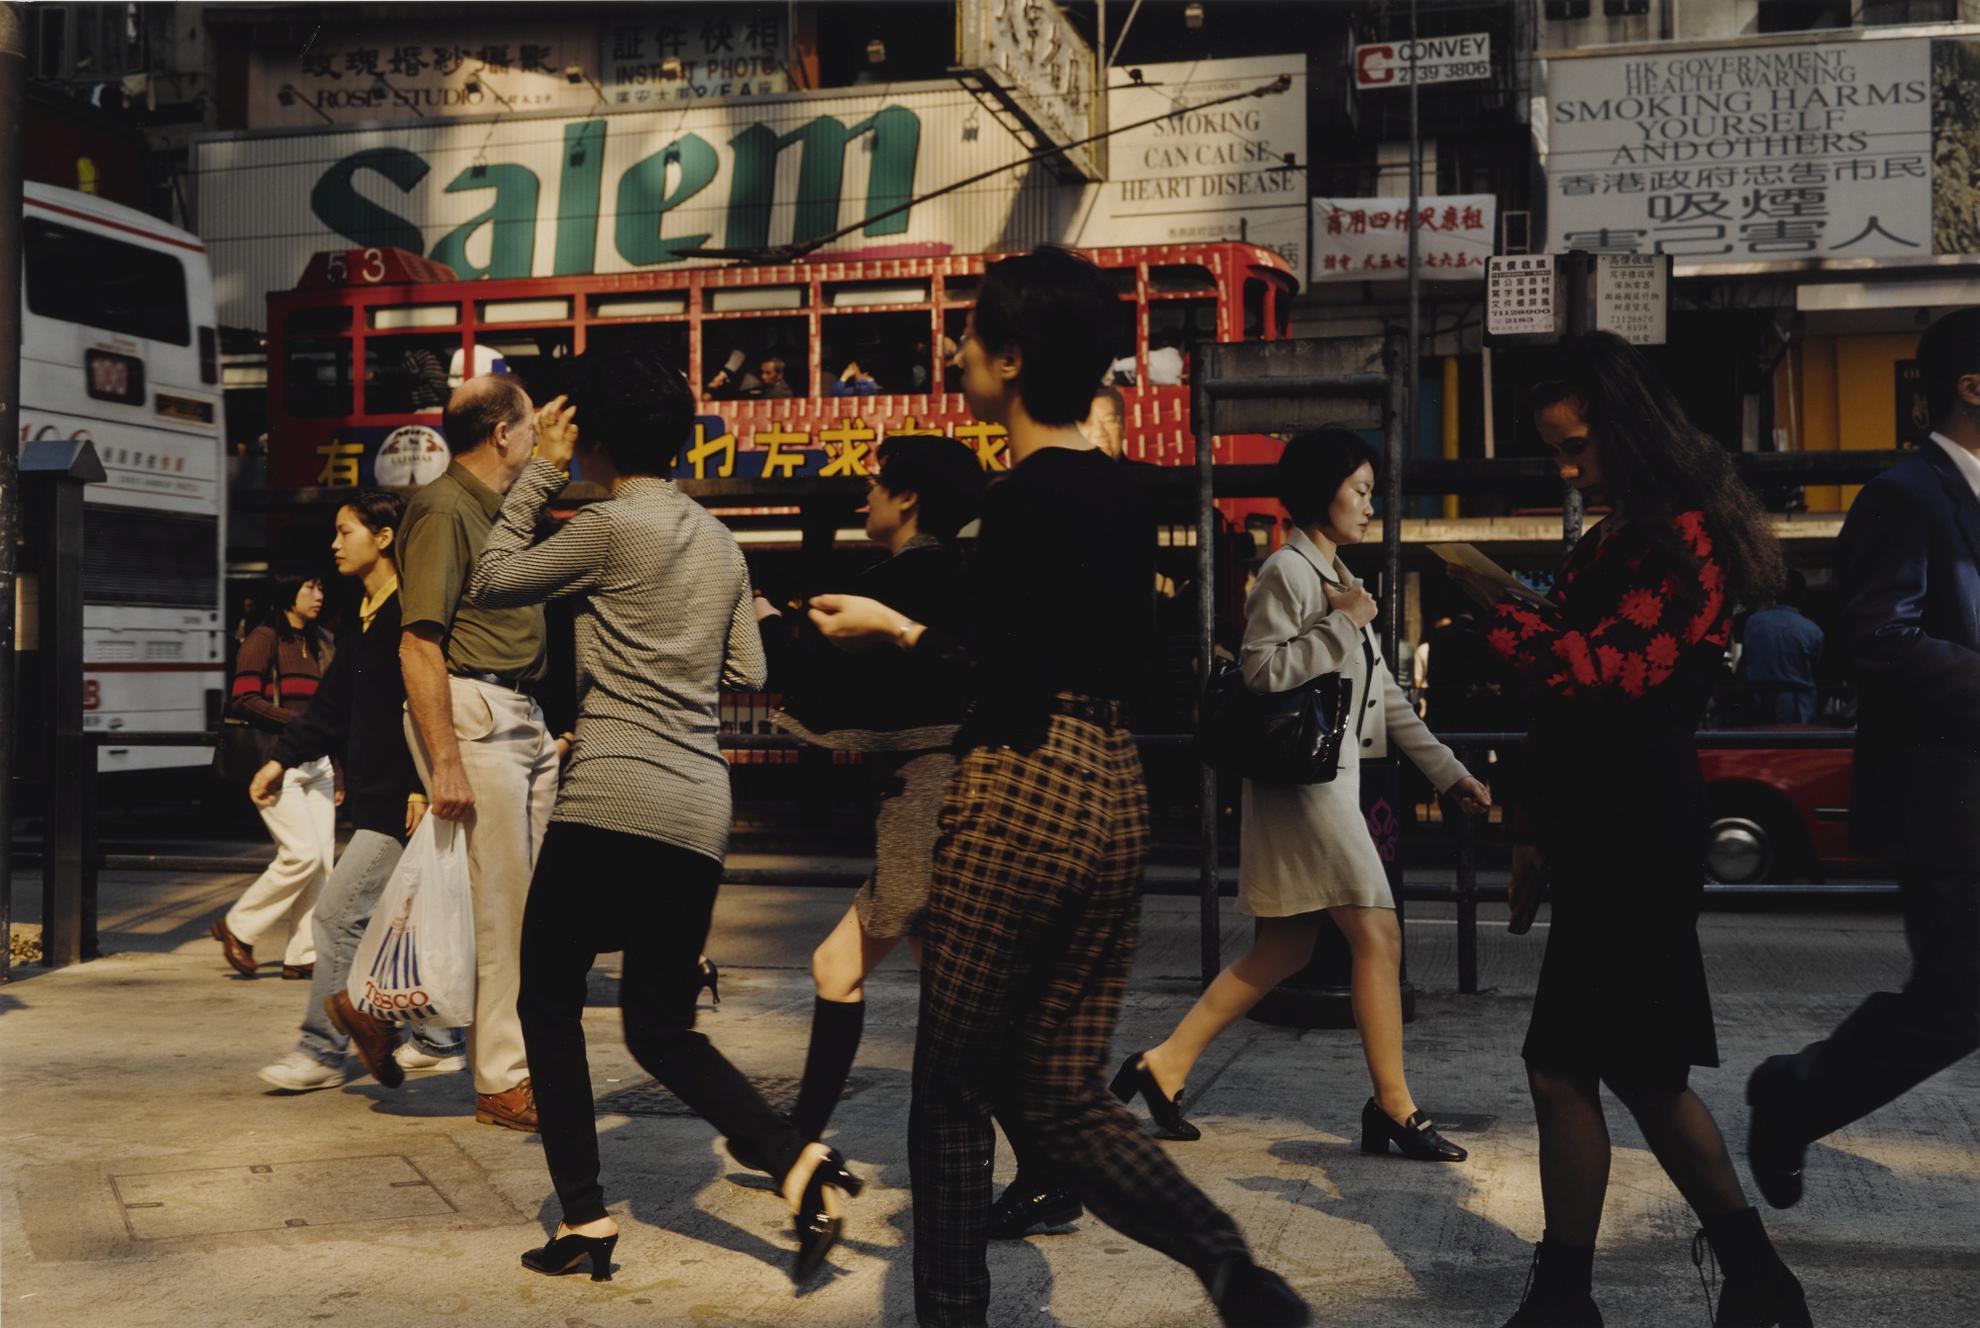 Philip-Lorca diCorcia-Hong Kong-1996